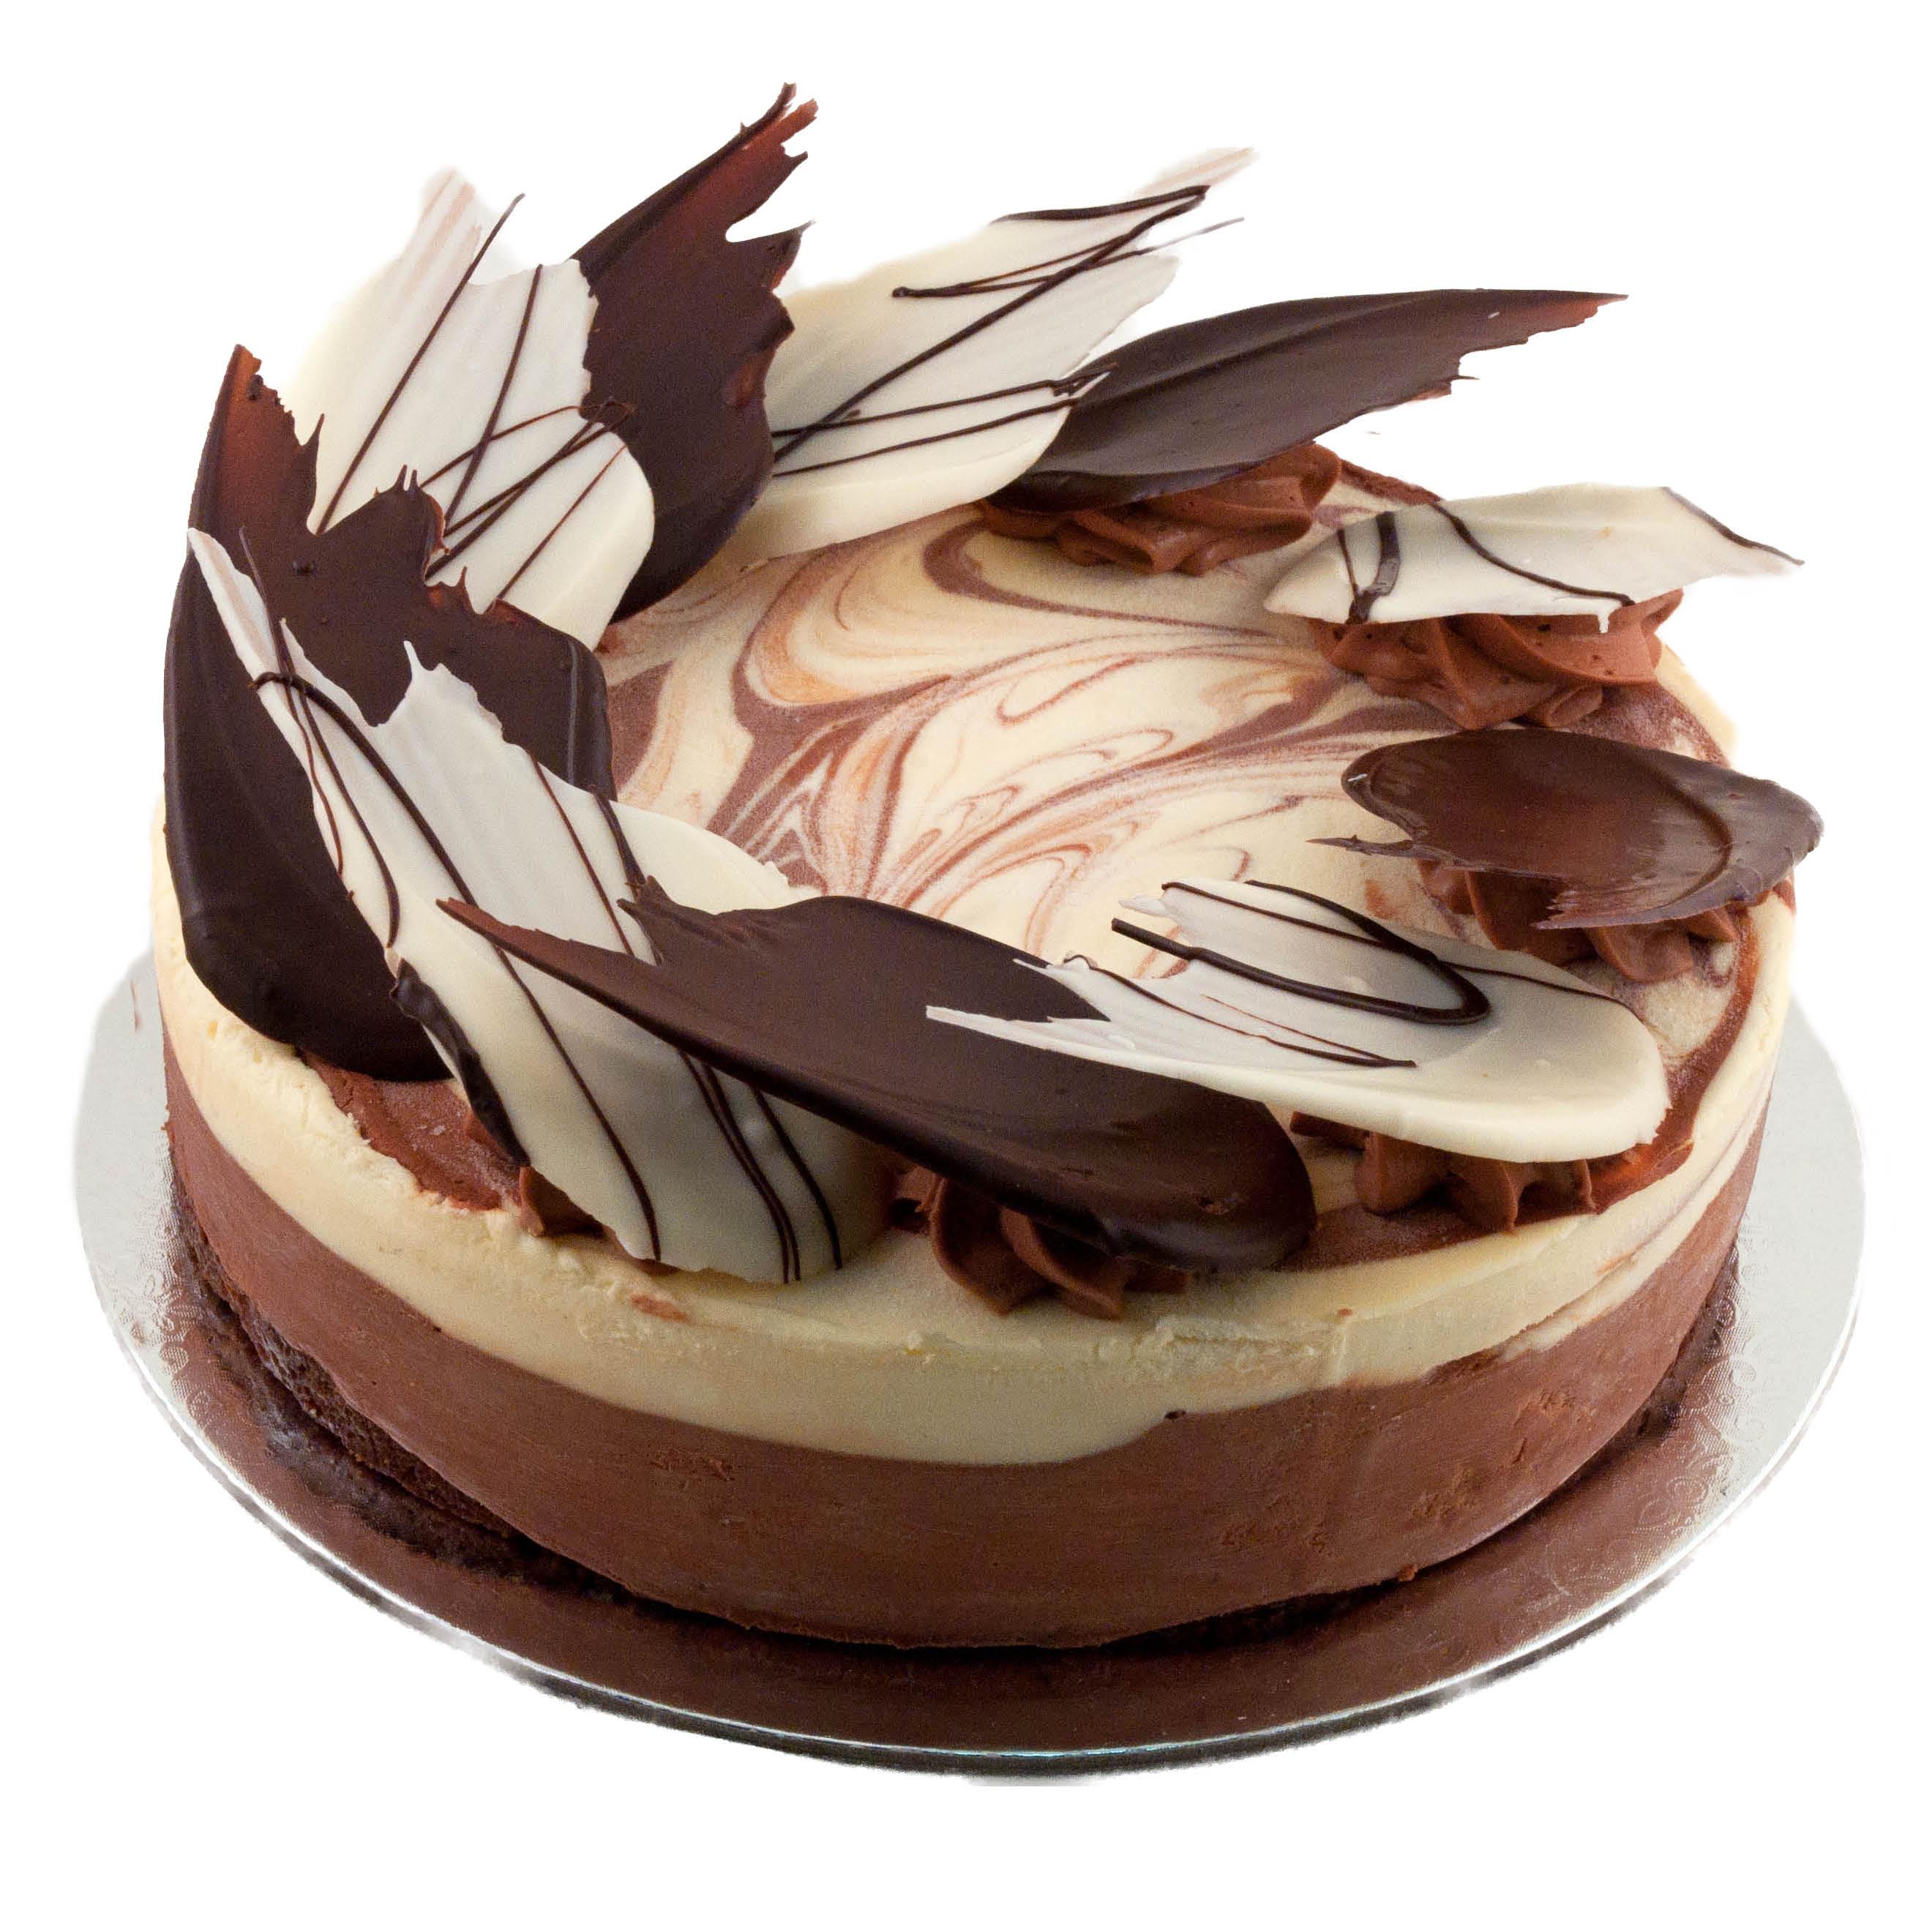 White And Dark Chocolate Mousse Cake